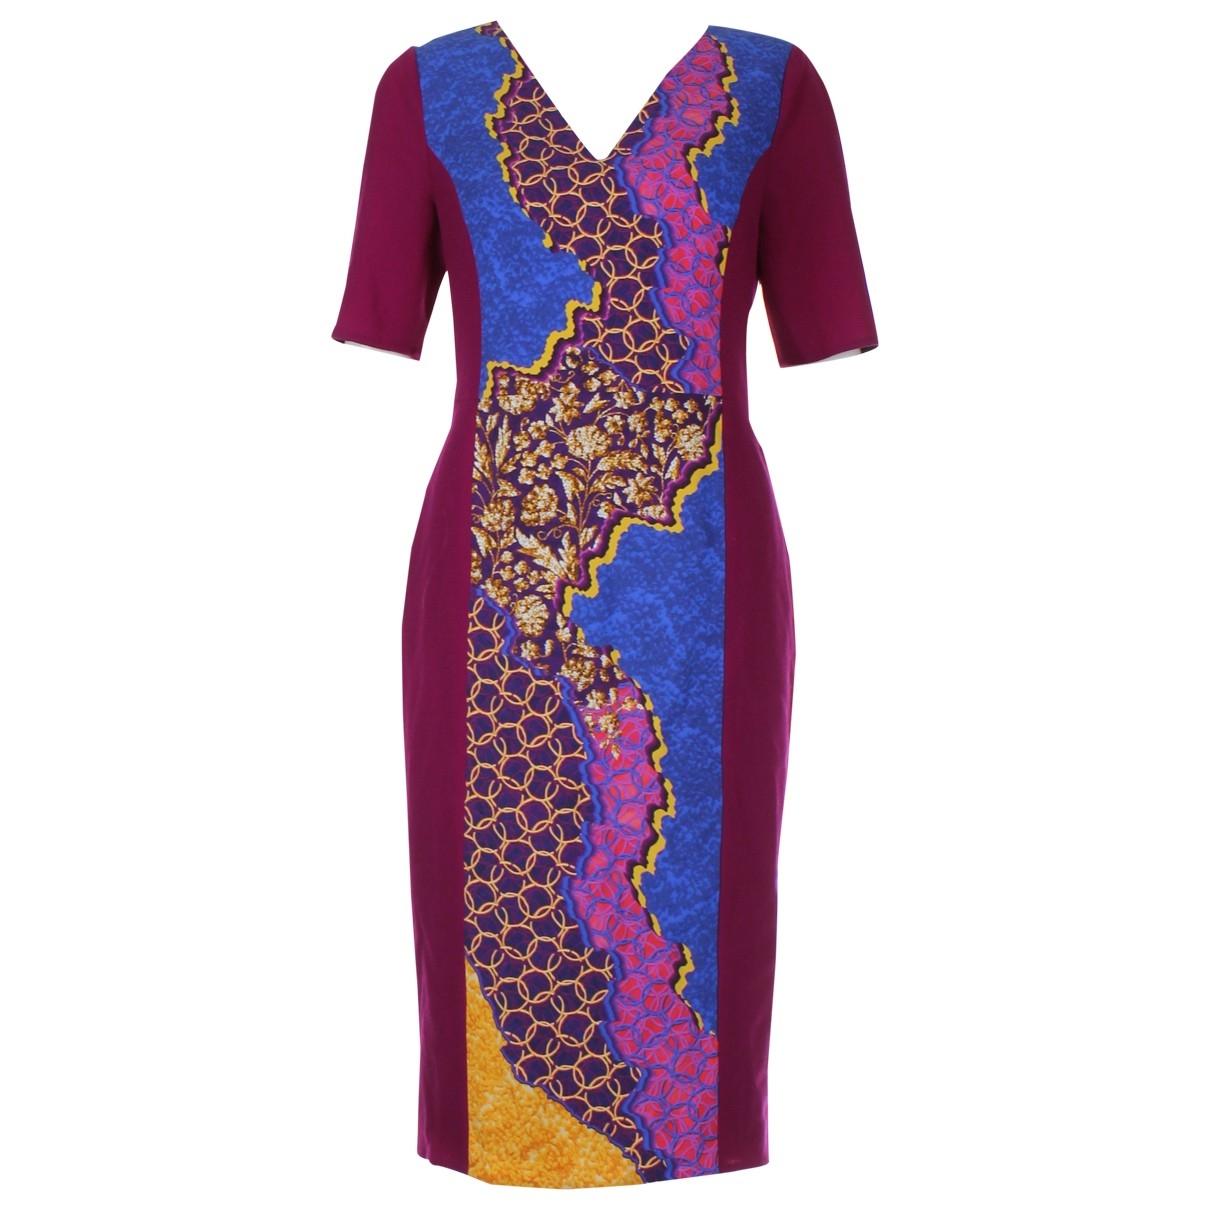 Peter Pilotto \N Pink Cotton dress for Women 12 UK